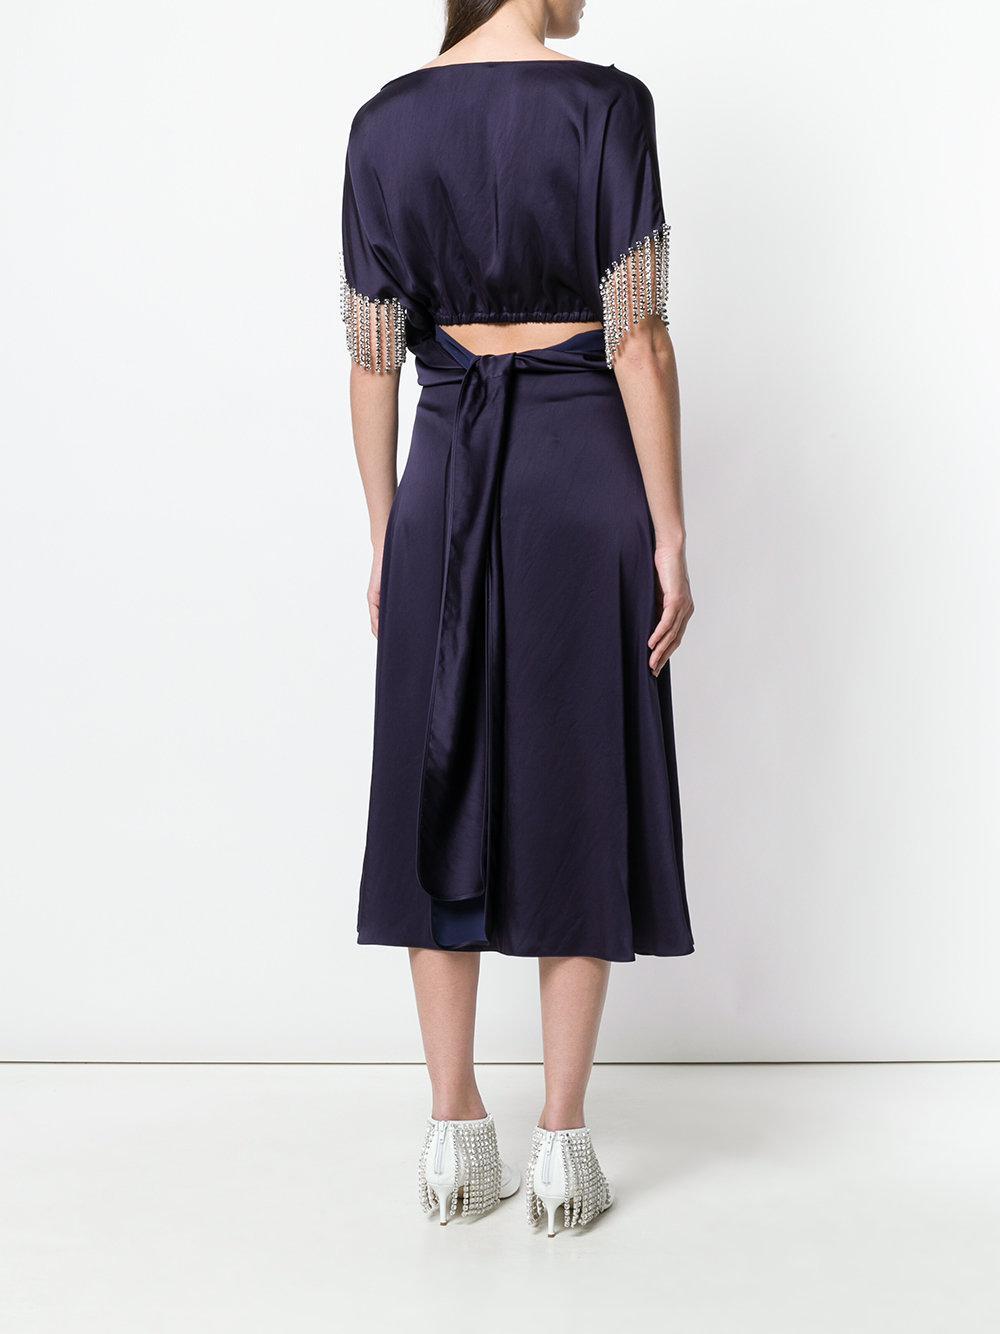 crystal satin dress - Blue Christopher Kane gVodAec5E